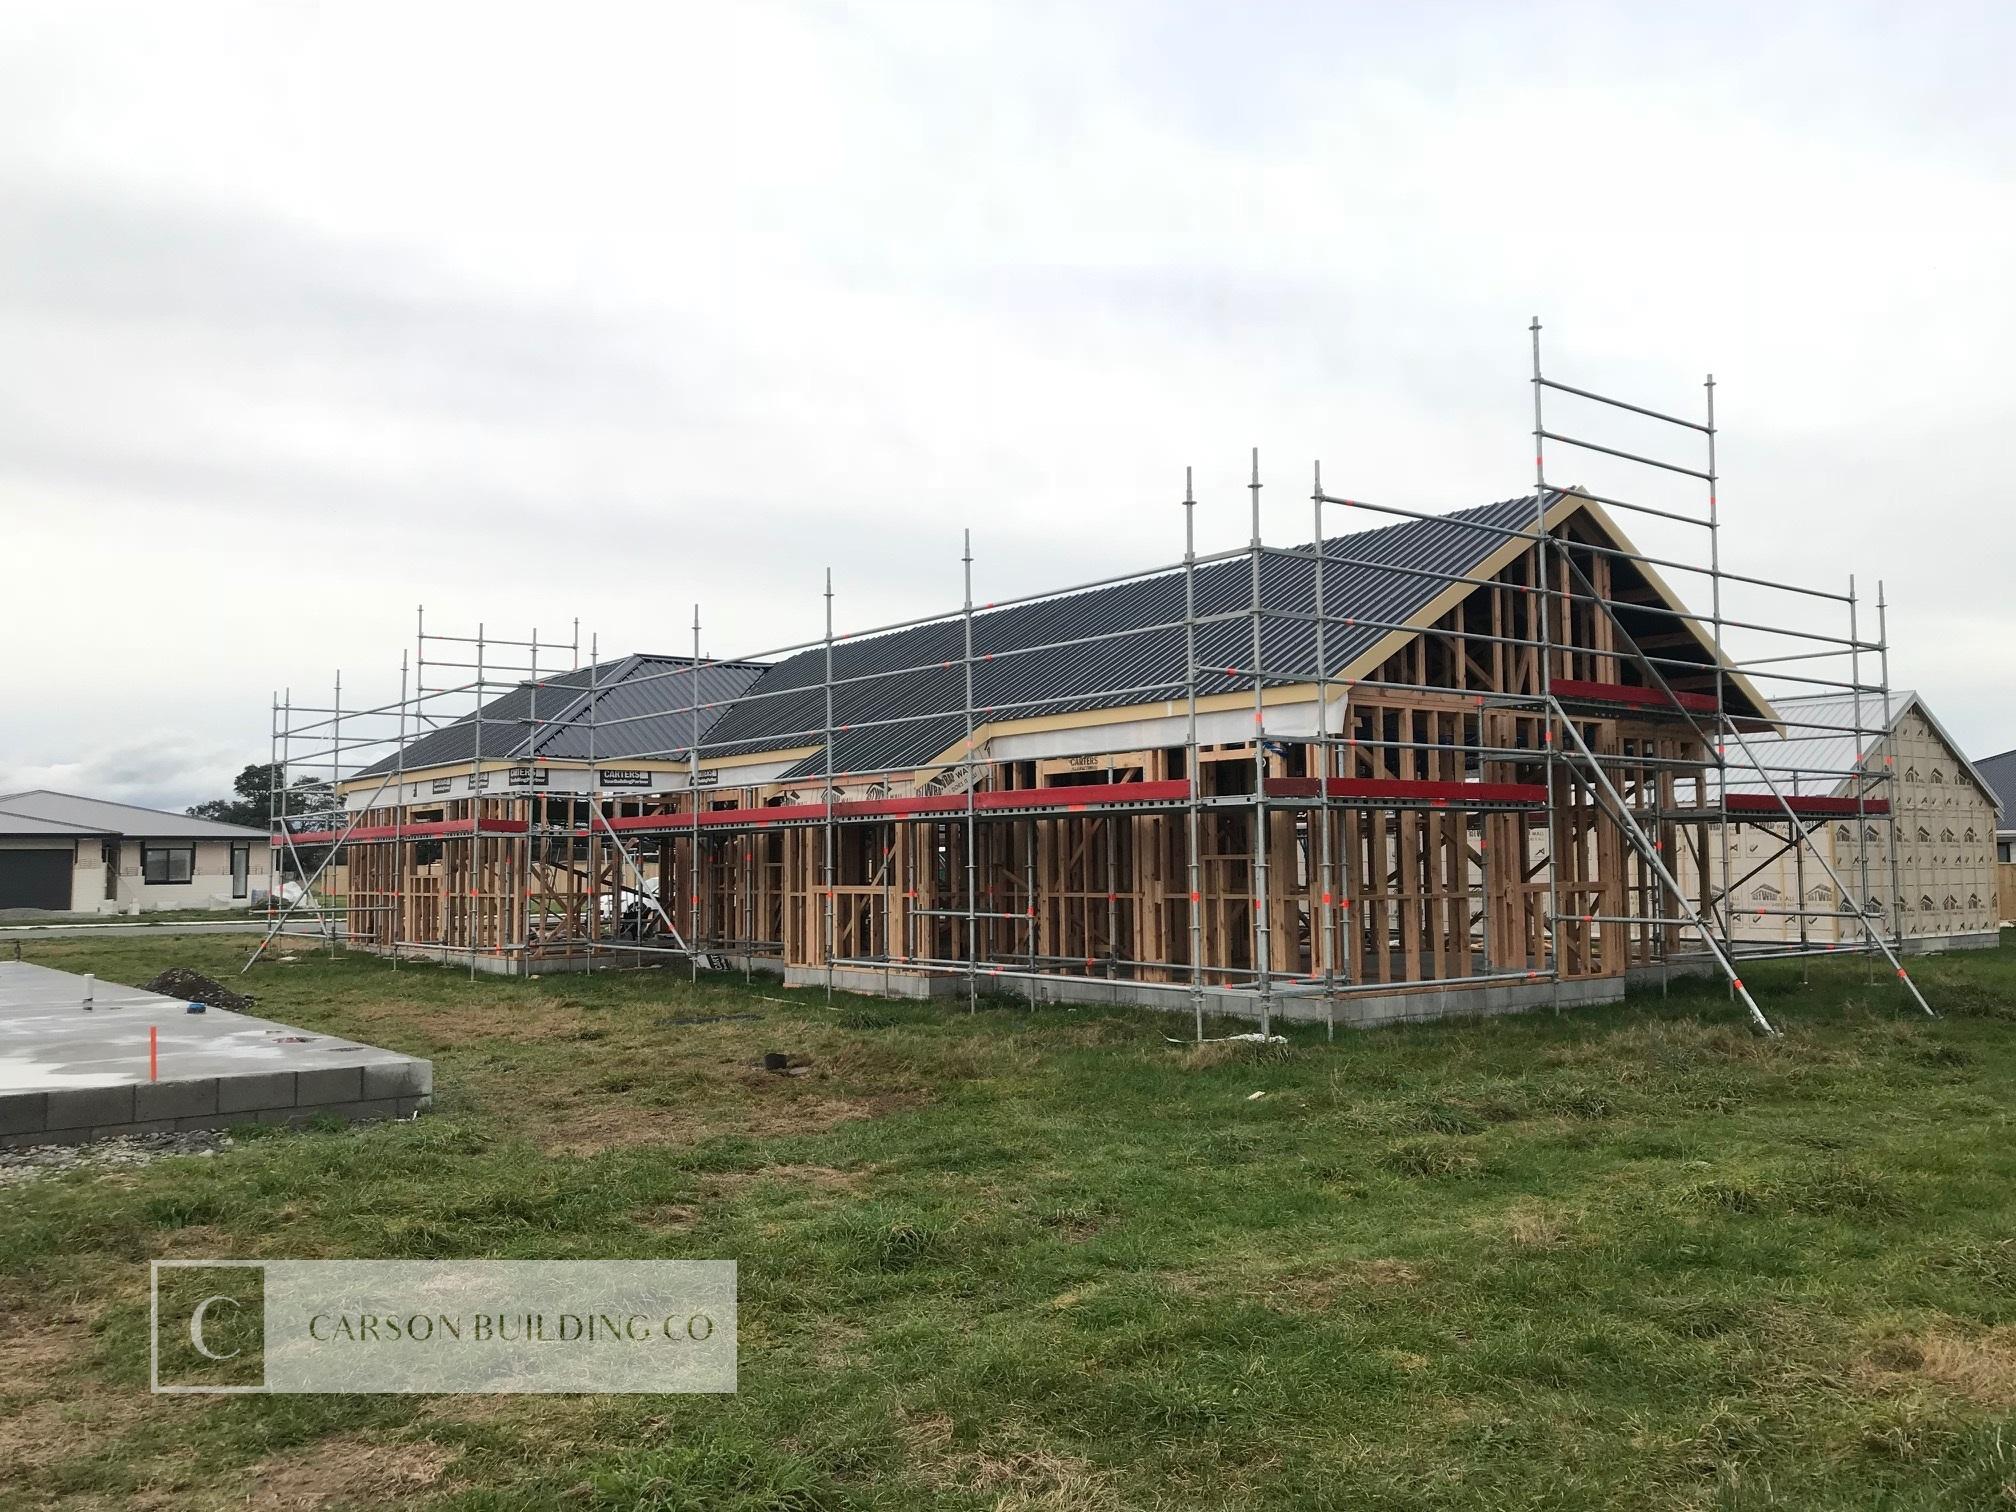 | Carson Building Co | Craigmillar House |